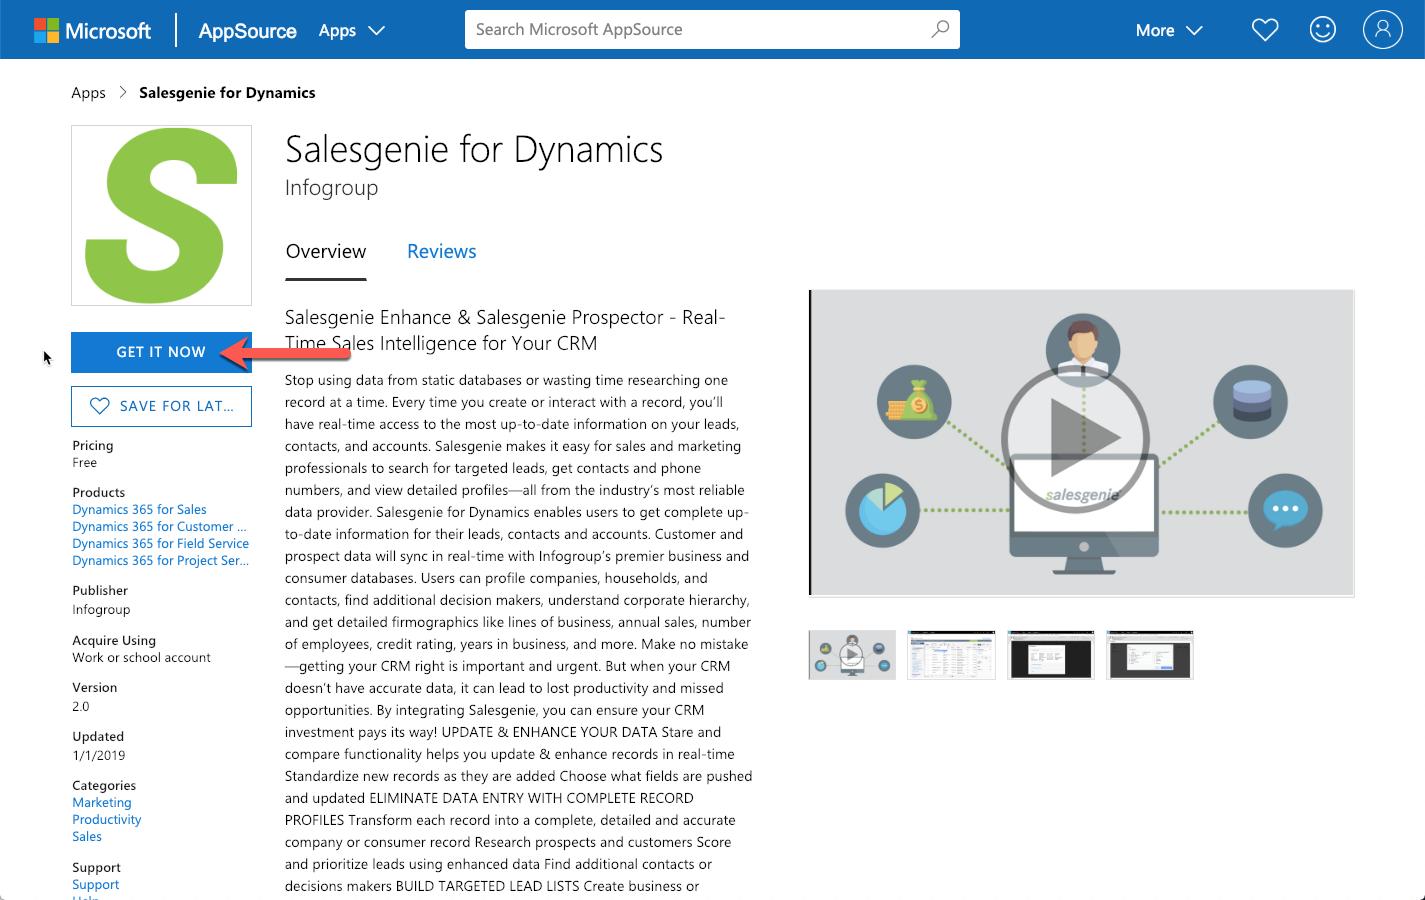 Salesgenie — Legacy Salesgenie for Dynamics 365 CRM